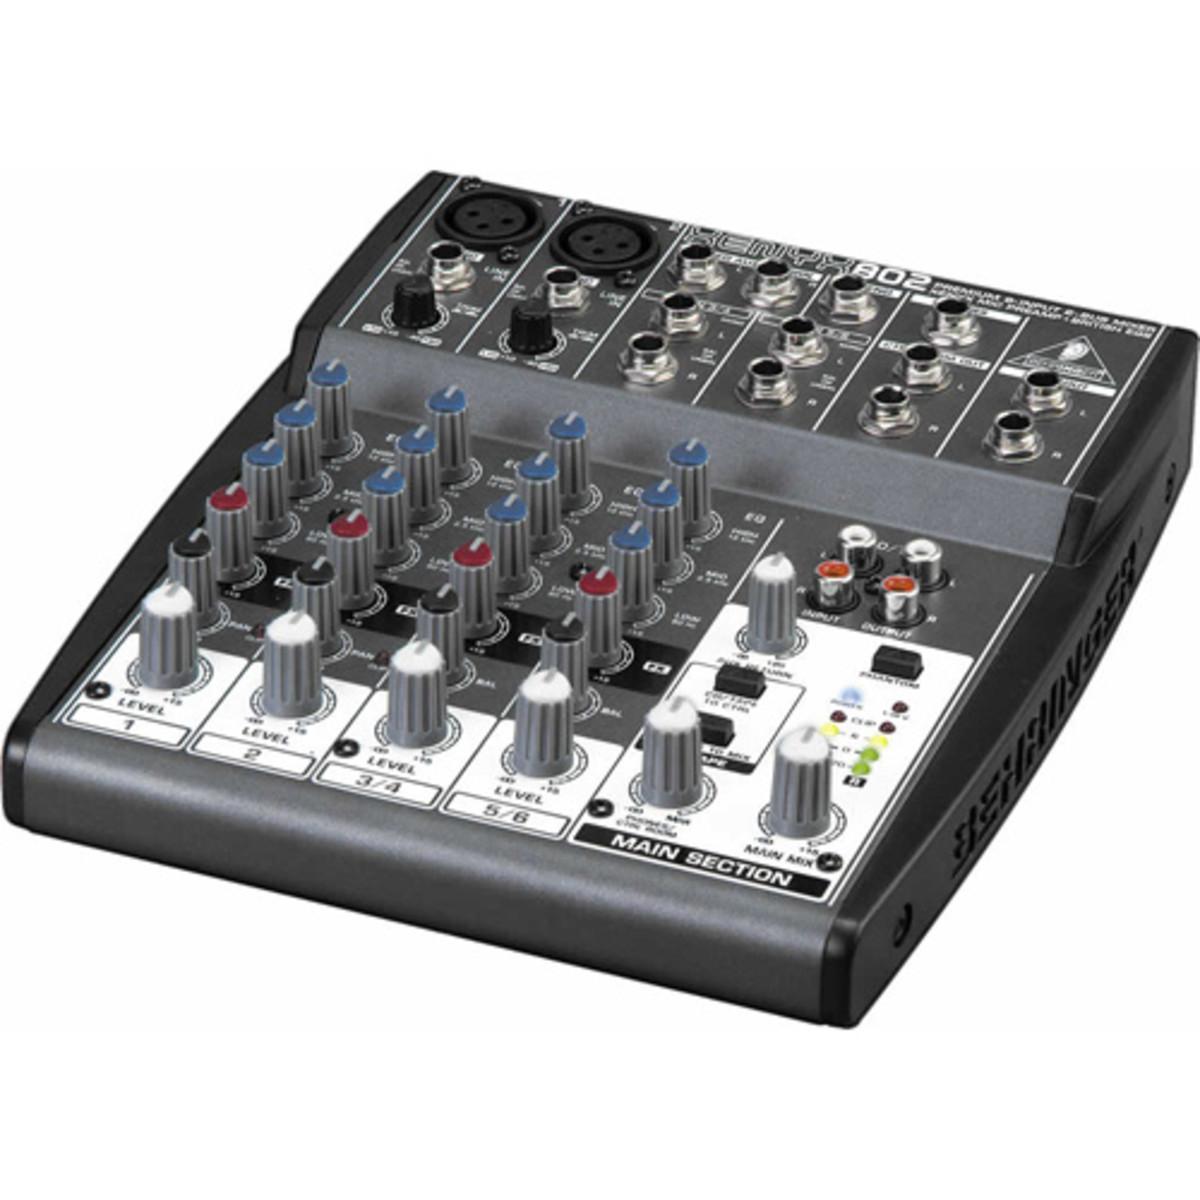 Photo Audio Video Mixing Software - Informer